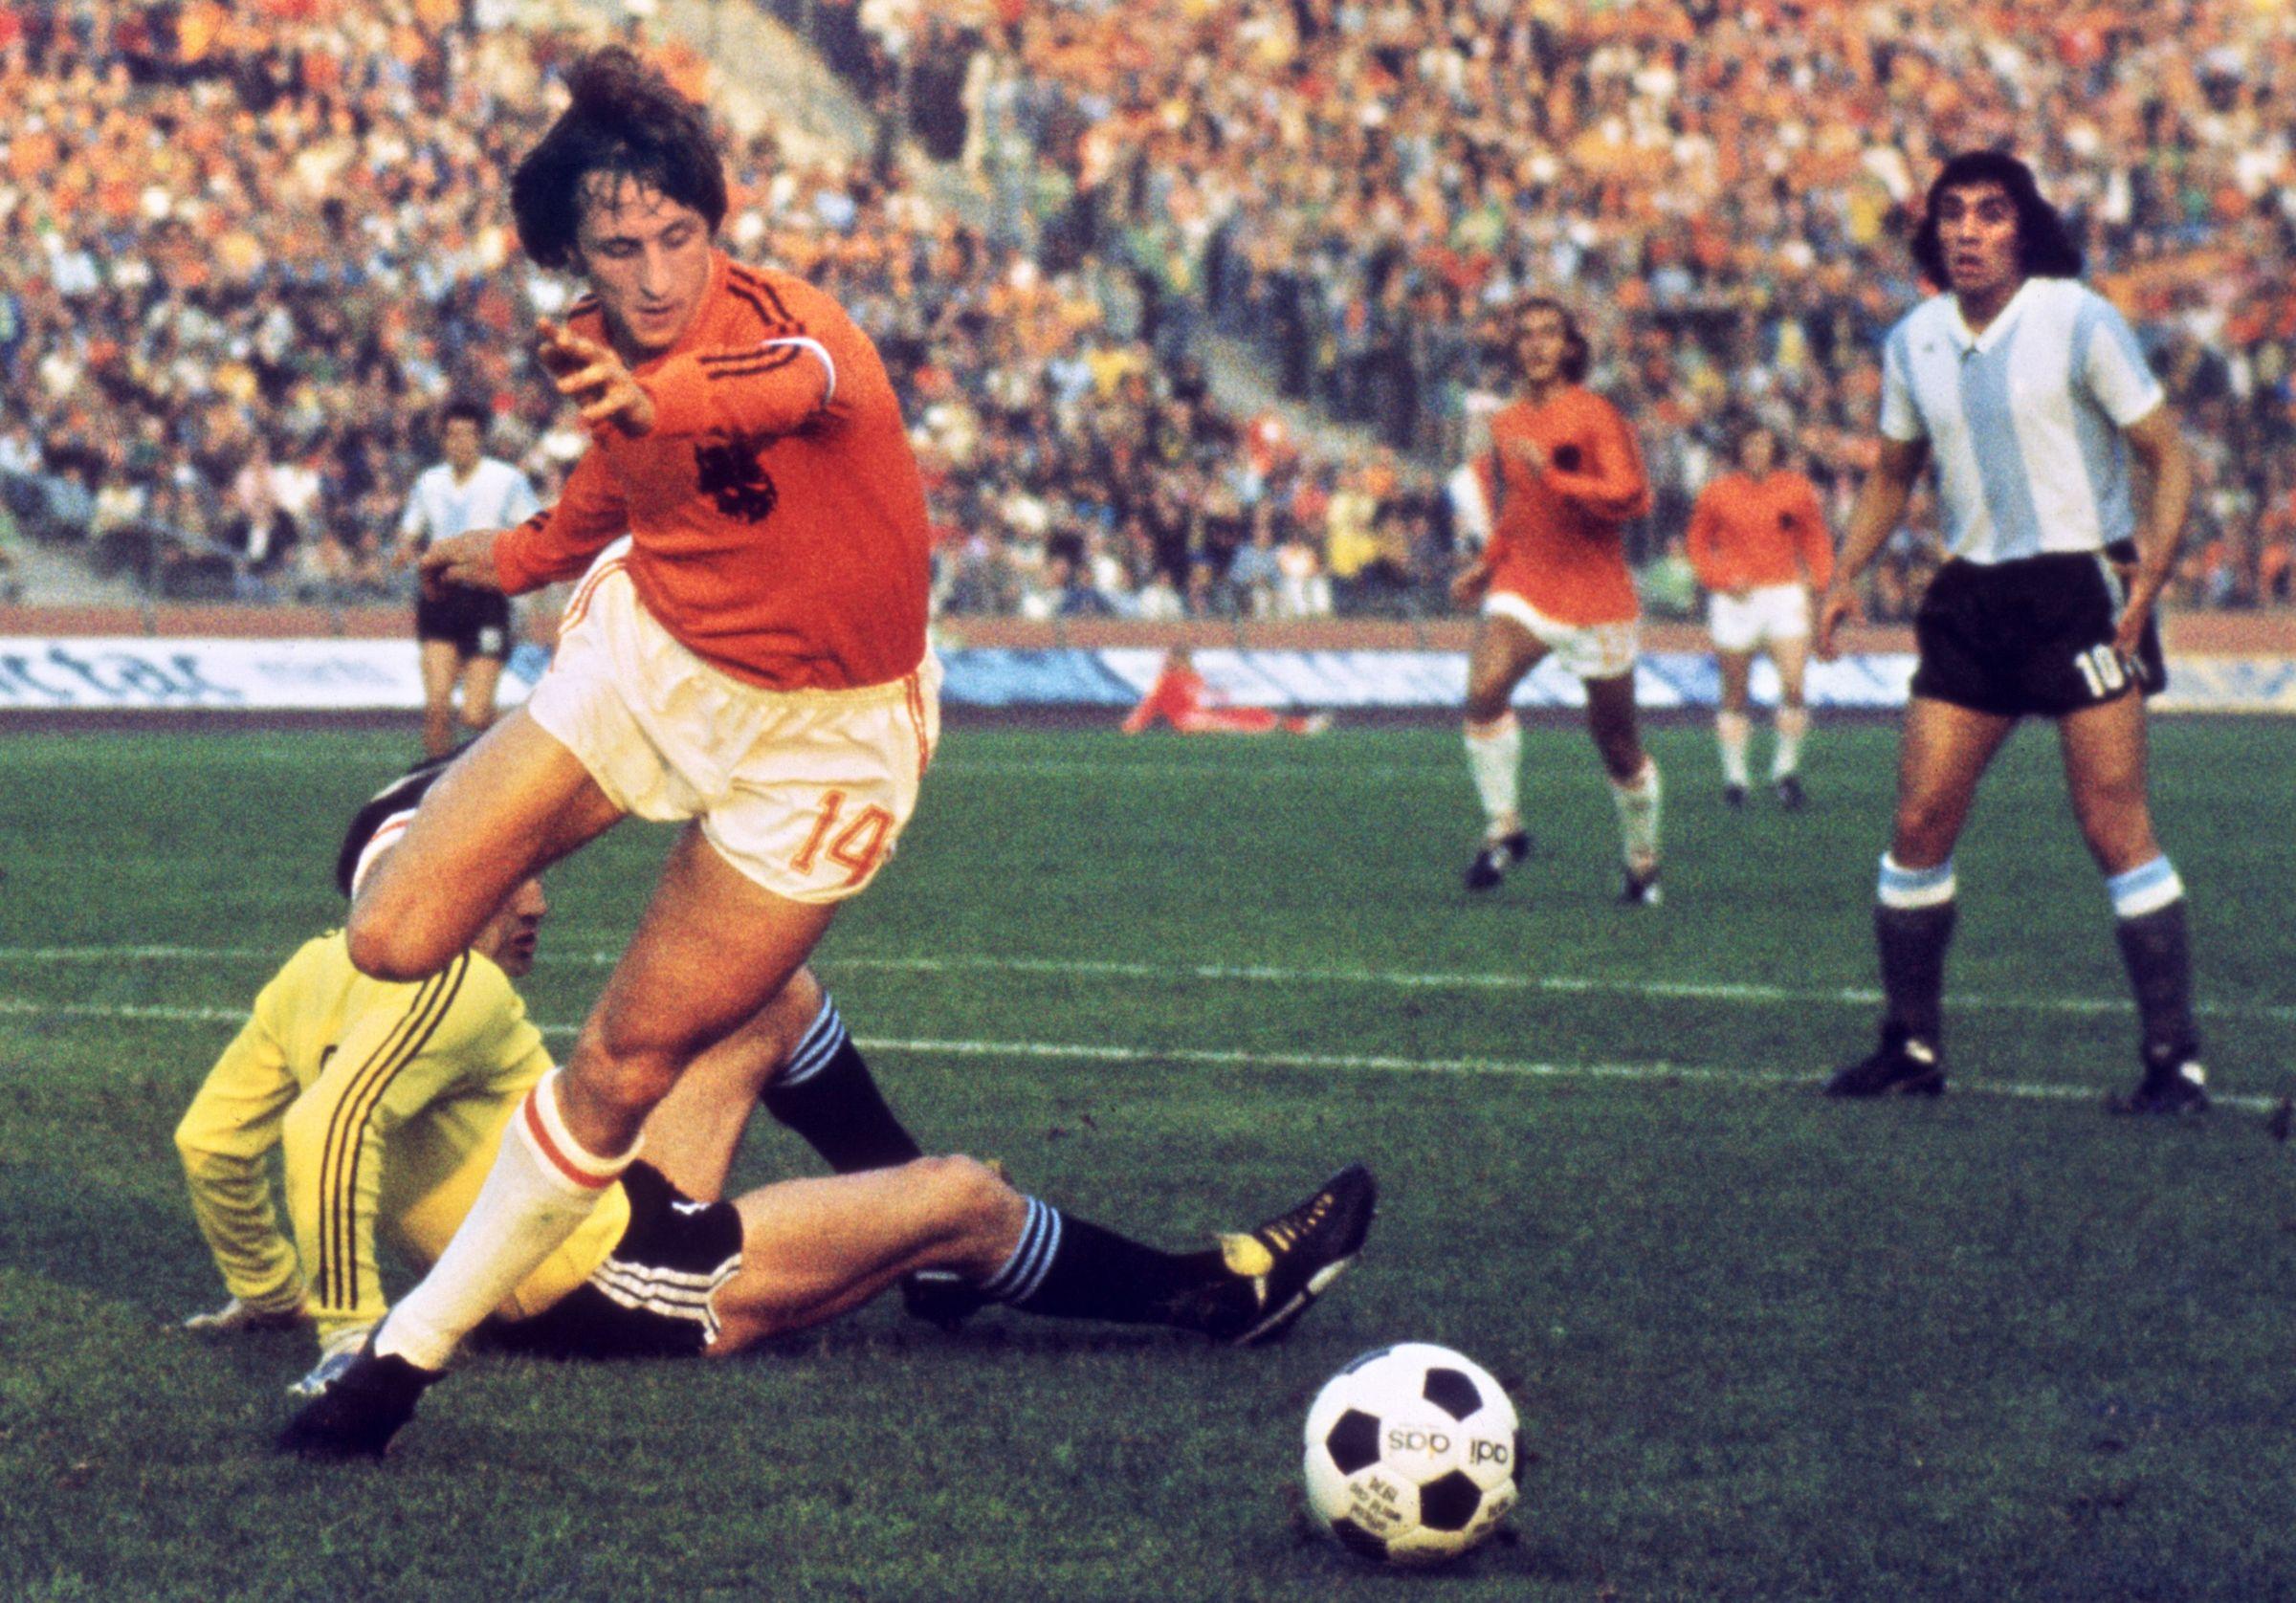 FILES-WORLD CUP-1974-CRUYFF-ARGENTINA VS HOLLAND